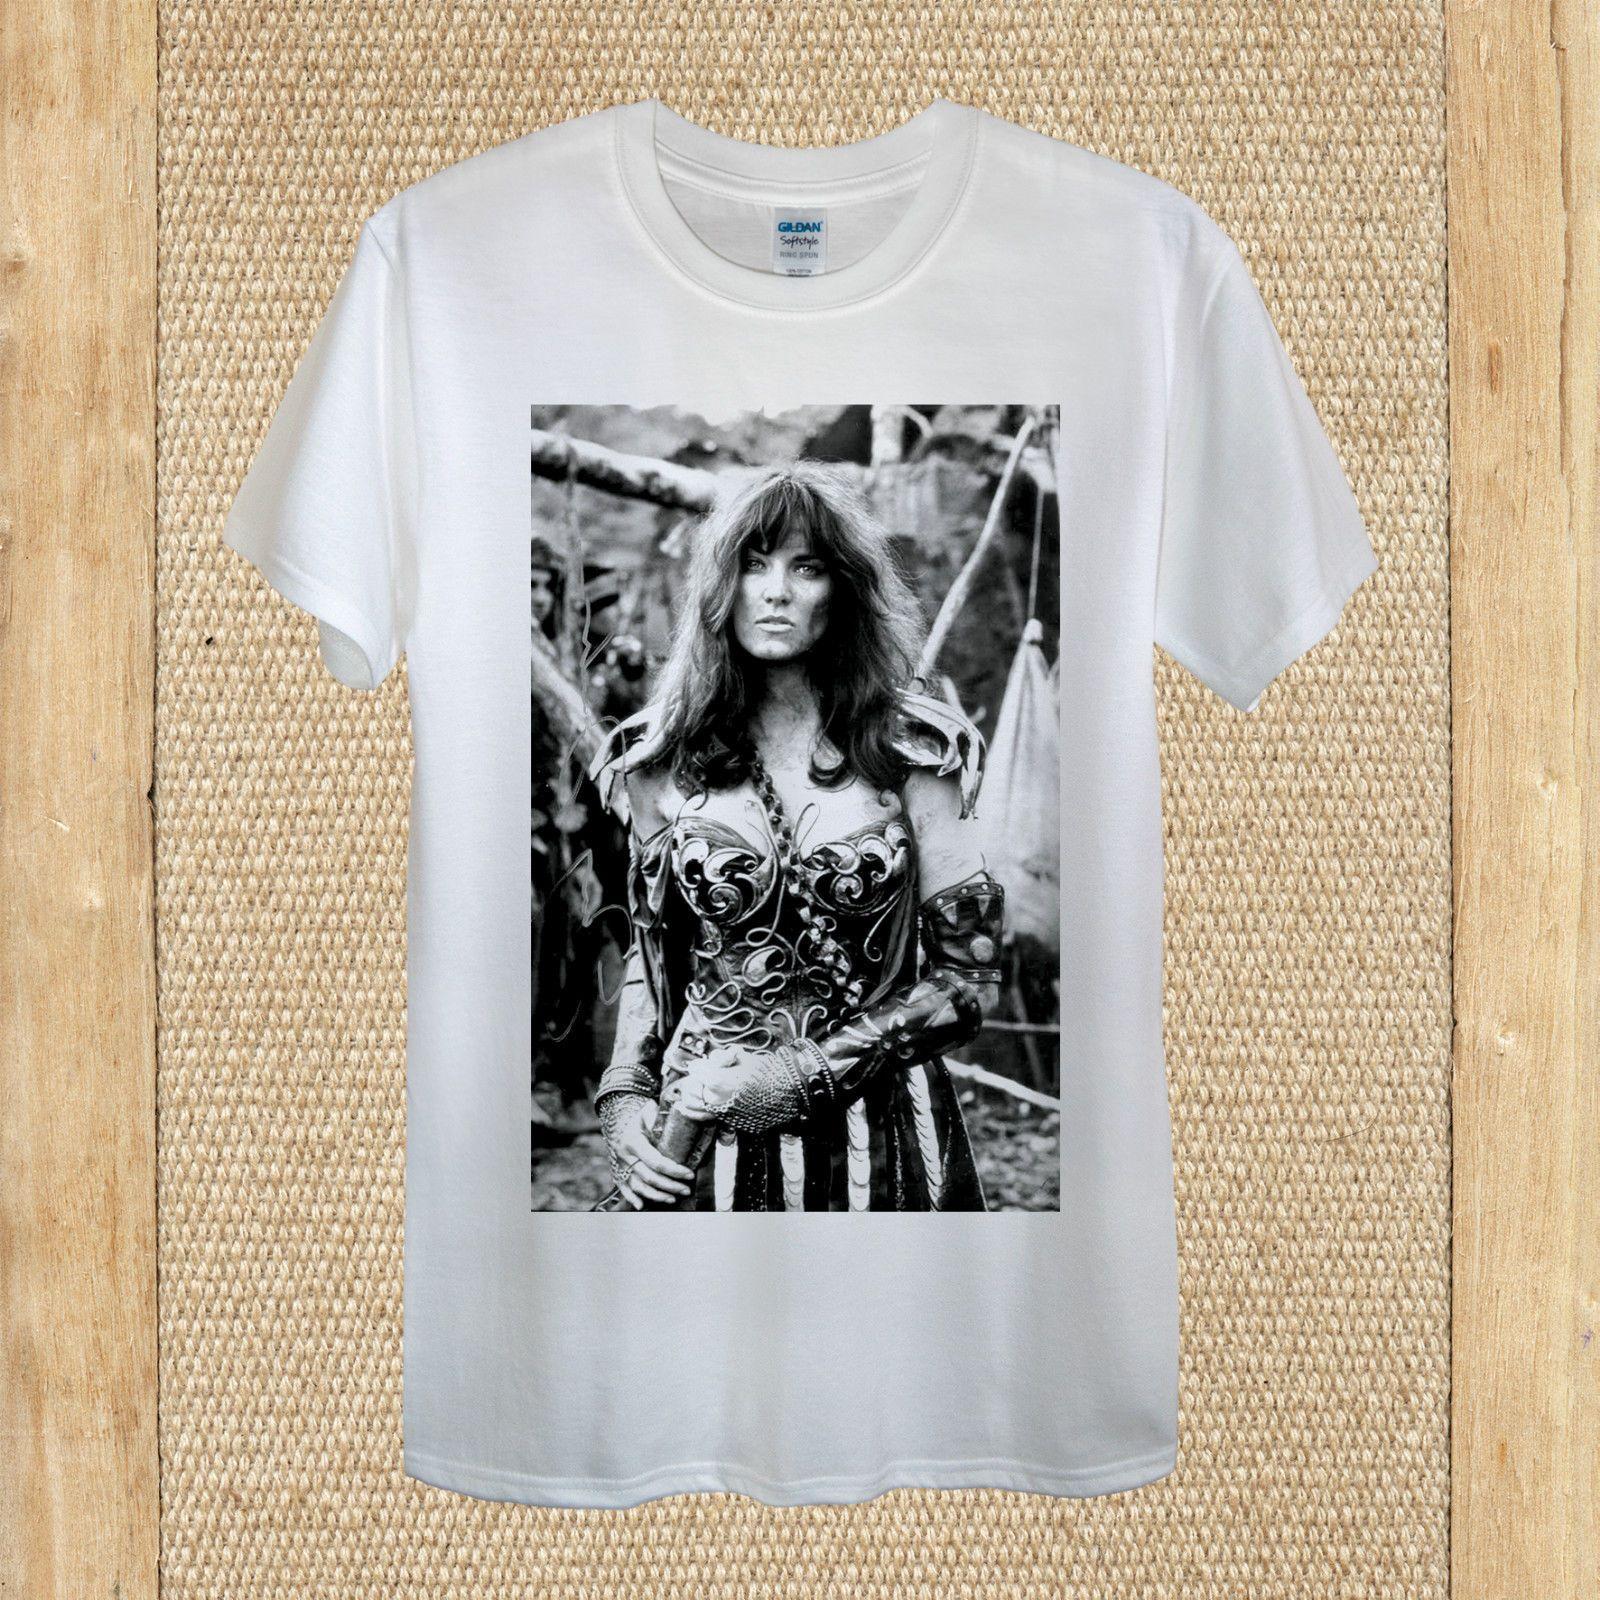 Wonder Großhandel Serie Xena Design Princess T Warrior Woman Shirt wqpYqA7O